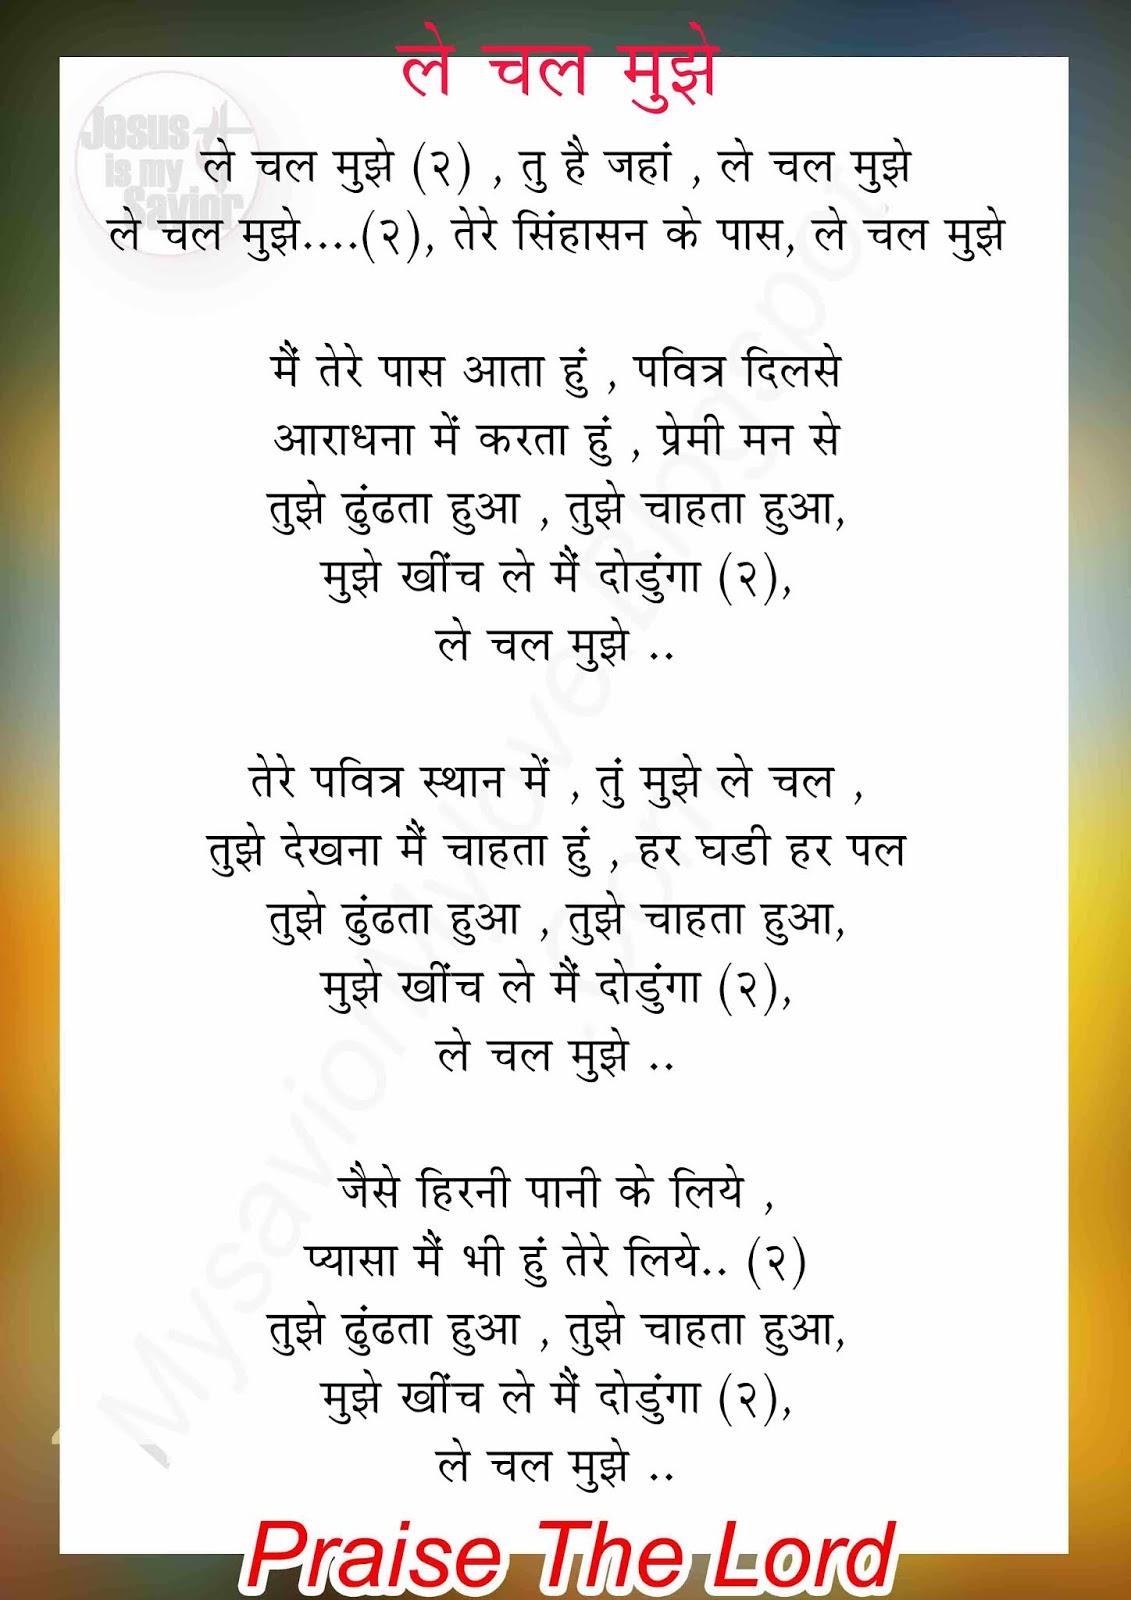 Le Chal Muze Le Chal Muze Jesus Song Lyrics Hindi À¤² À¤šà¤² À¤® À¤ À¤² À¤šà¤² À¤® À¤ À¤¤ À¤¹ À¤œà¤¹ À¤œ À¤¸à¤¸ À¤¸ À¤¨ À¤— À¤² À¤° À¤• À¤¸ New Christian Song S Lyrics Darenge nahi ( डरेंगे नहीं ) new hindi christian song 2021 (lyrics) अब तक tumsa koi nahi , tumsa kahin nahin jesus song lyrics hindi तुमसा कोई नहीं ,तुमसा कहीं नहीं जीसस सोंग लिरिक्स हिंदी tumasa k. le chal muze le chal muze jesus song